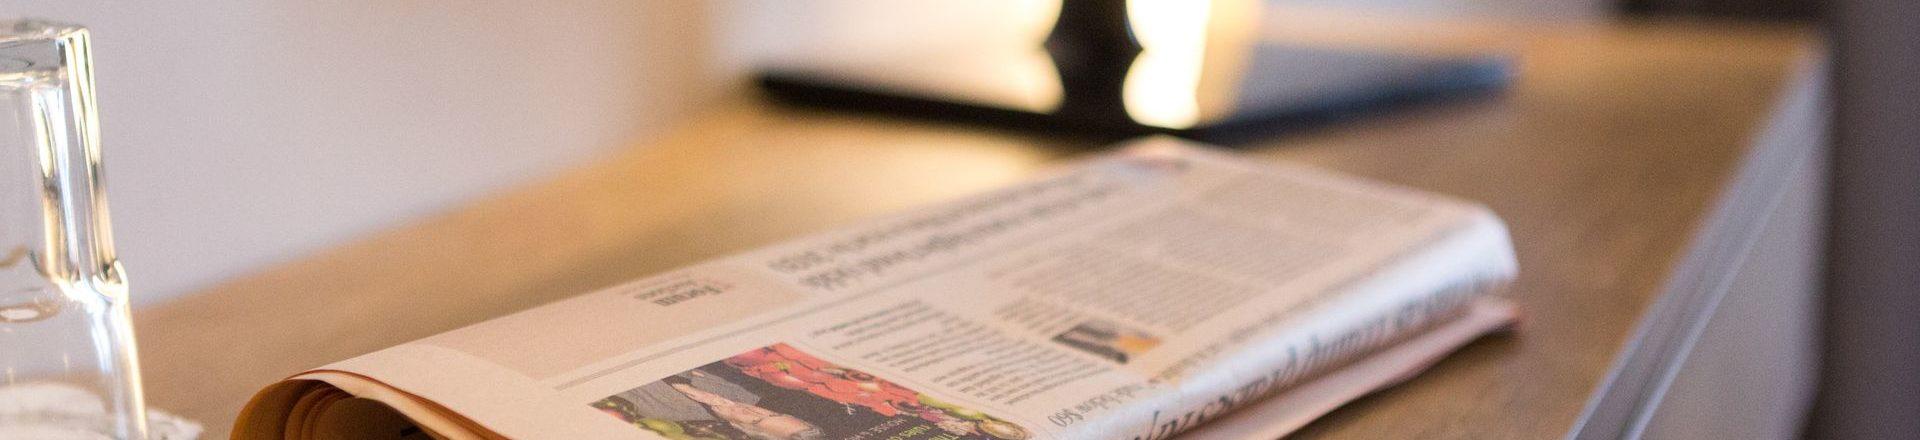 Minavra Newspapper